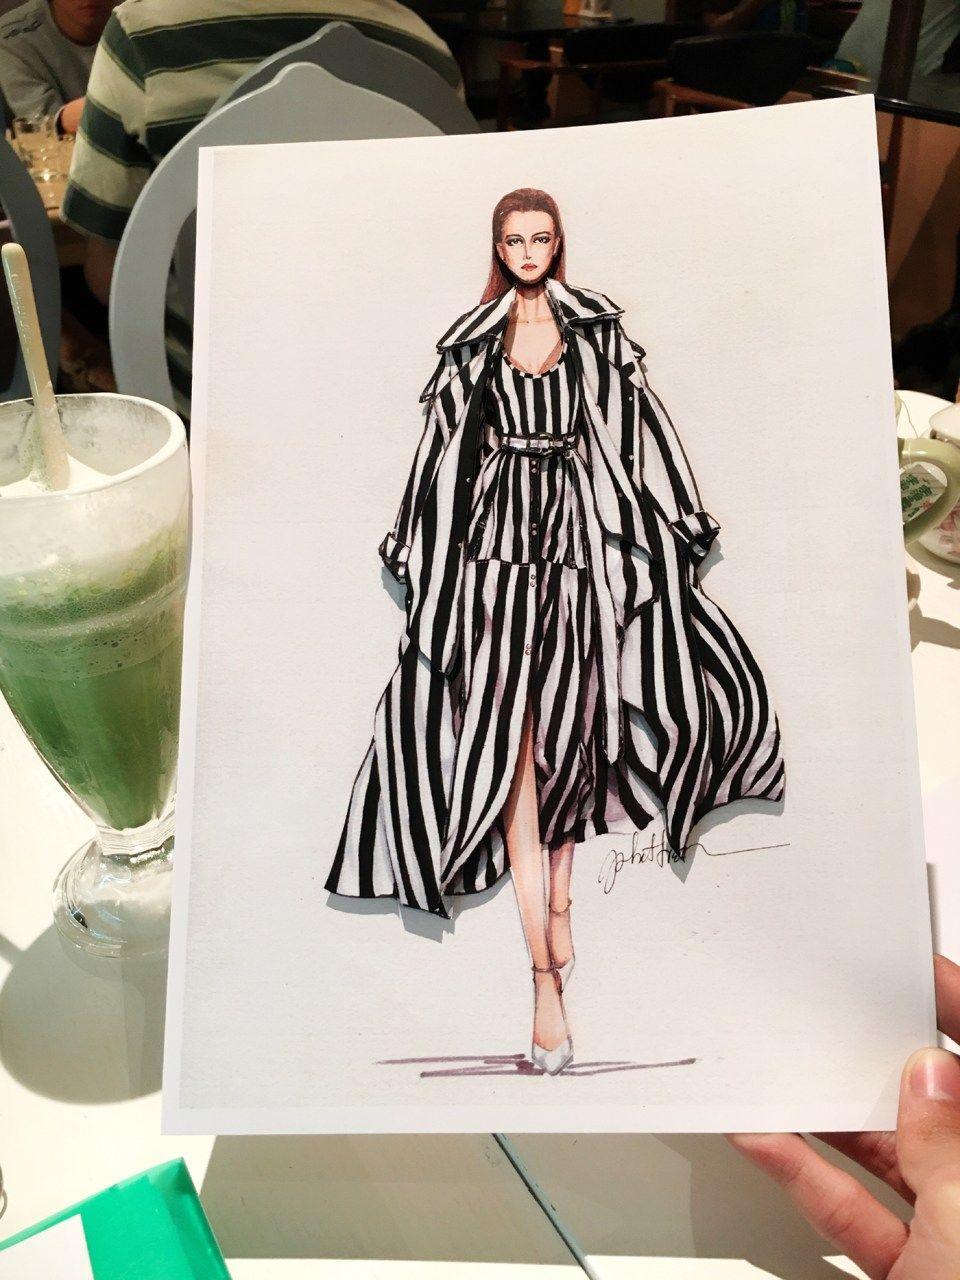 Instituto milano de moda inspire se com as ilustra es for Fashion designer milano